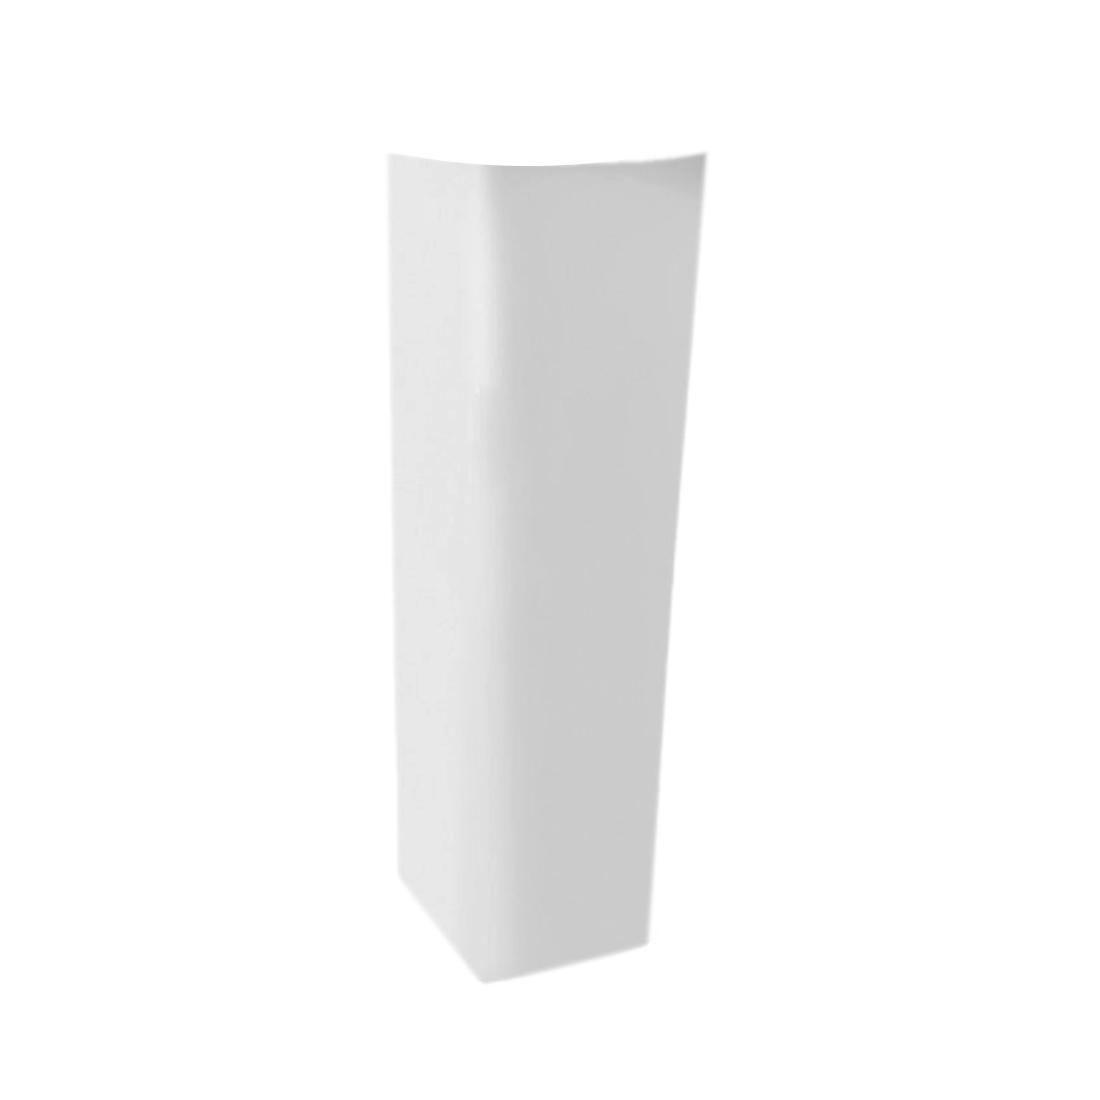 Kerovit 309 Full Pedestal